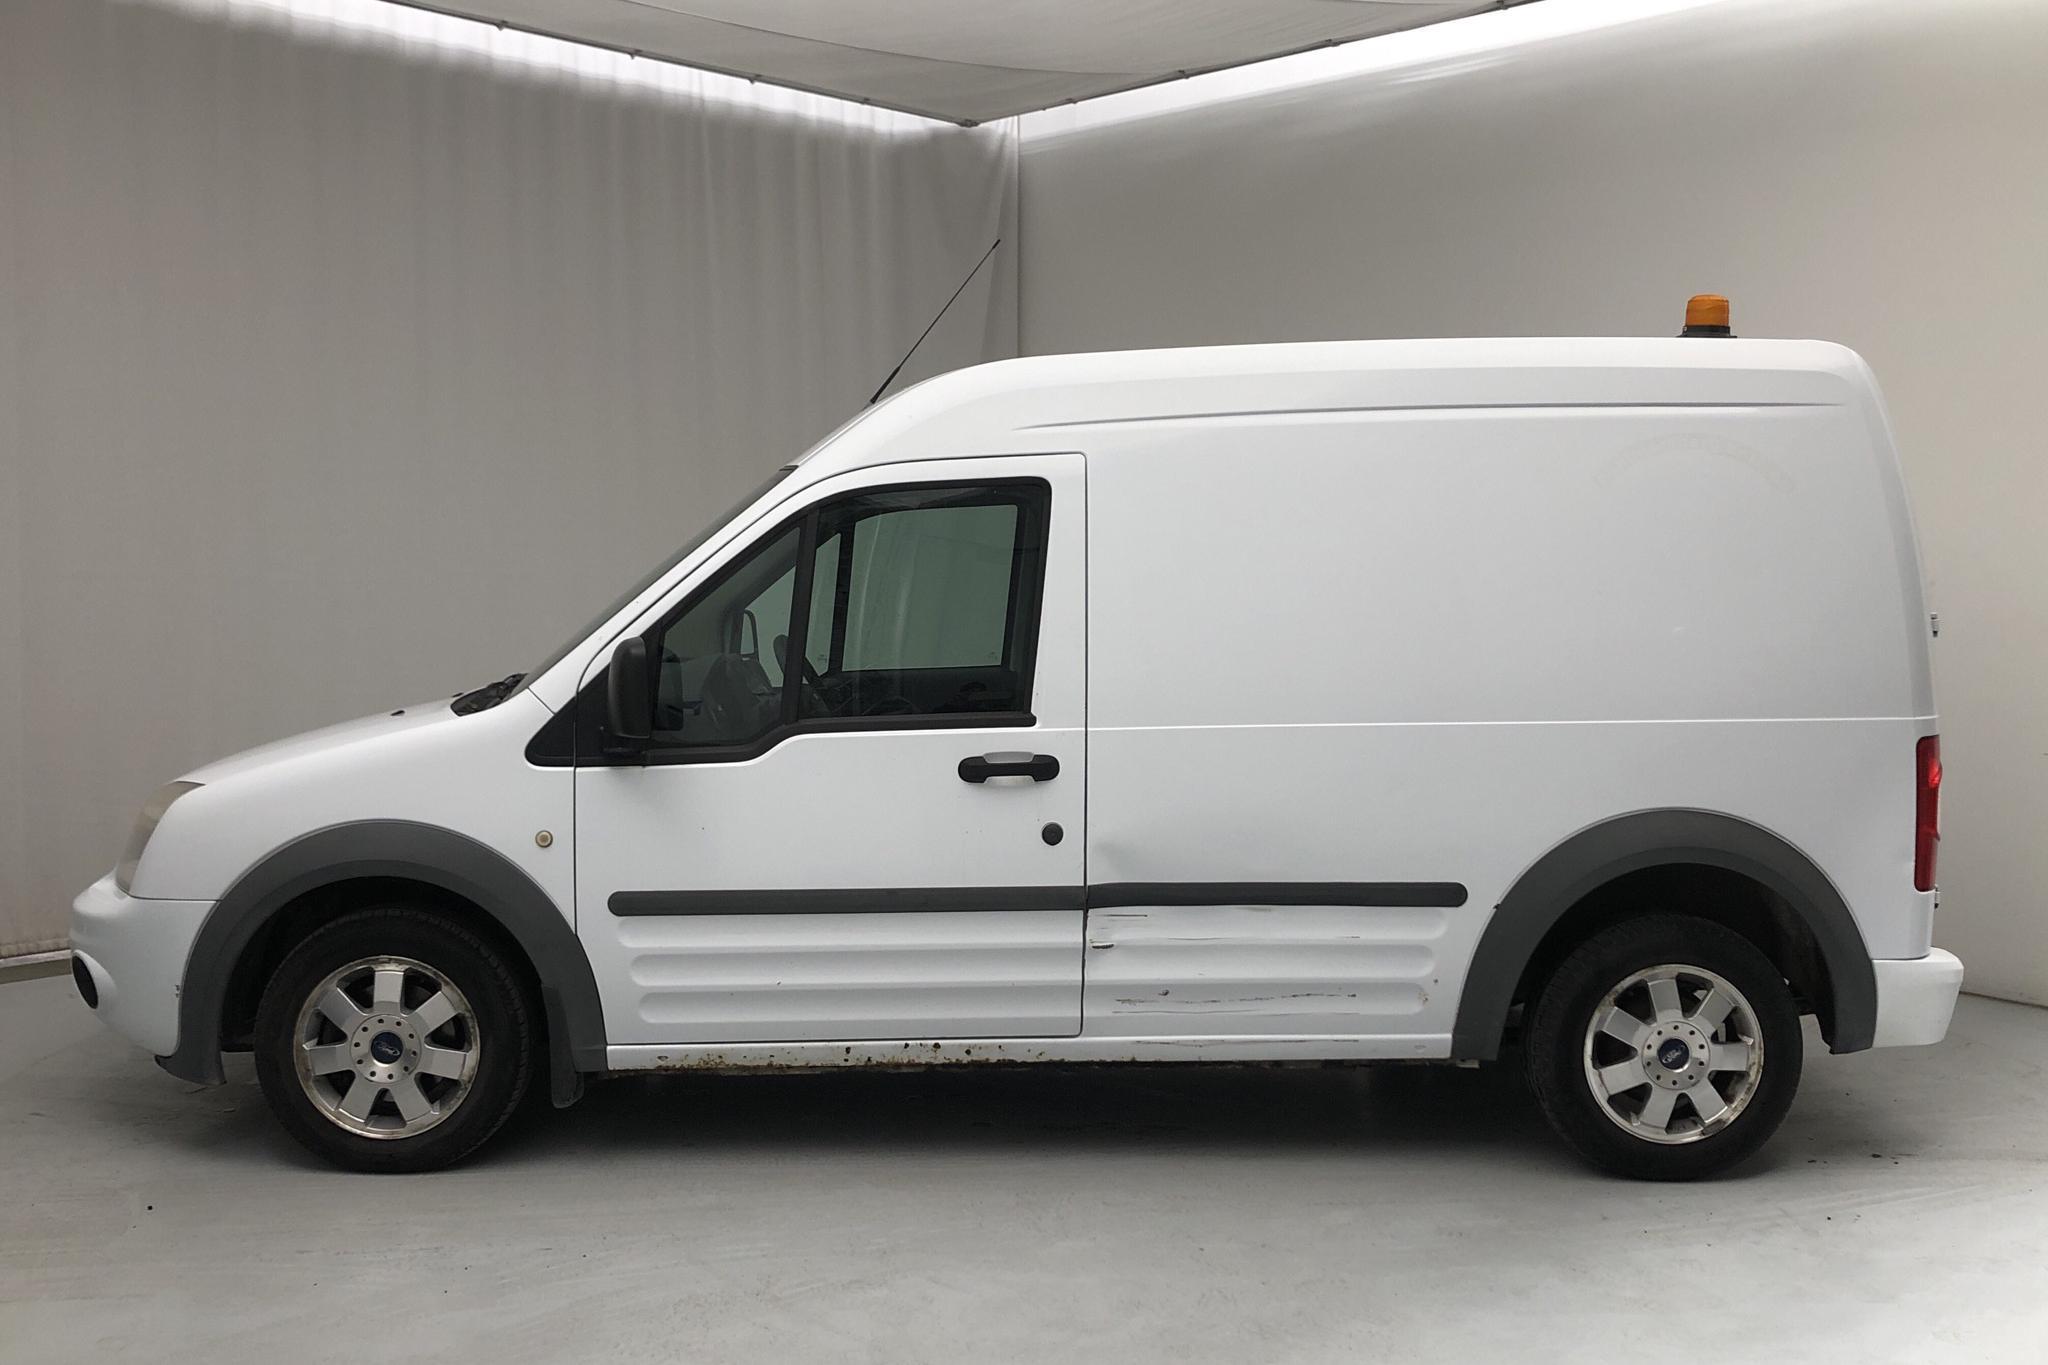 Ford Transit Connect 1.8 TDCi (110hk) - 15 915 mil - Manuell - vit - 2009